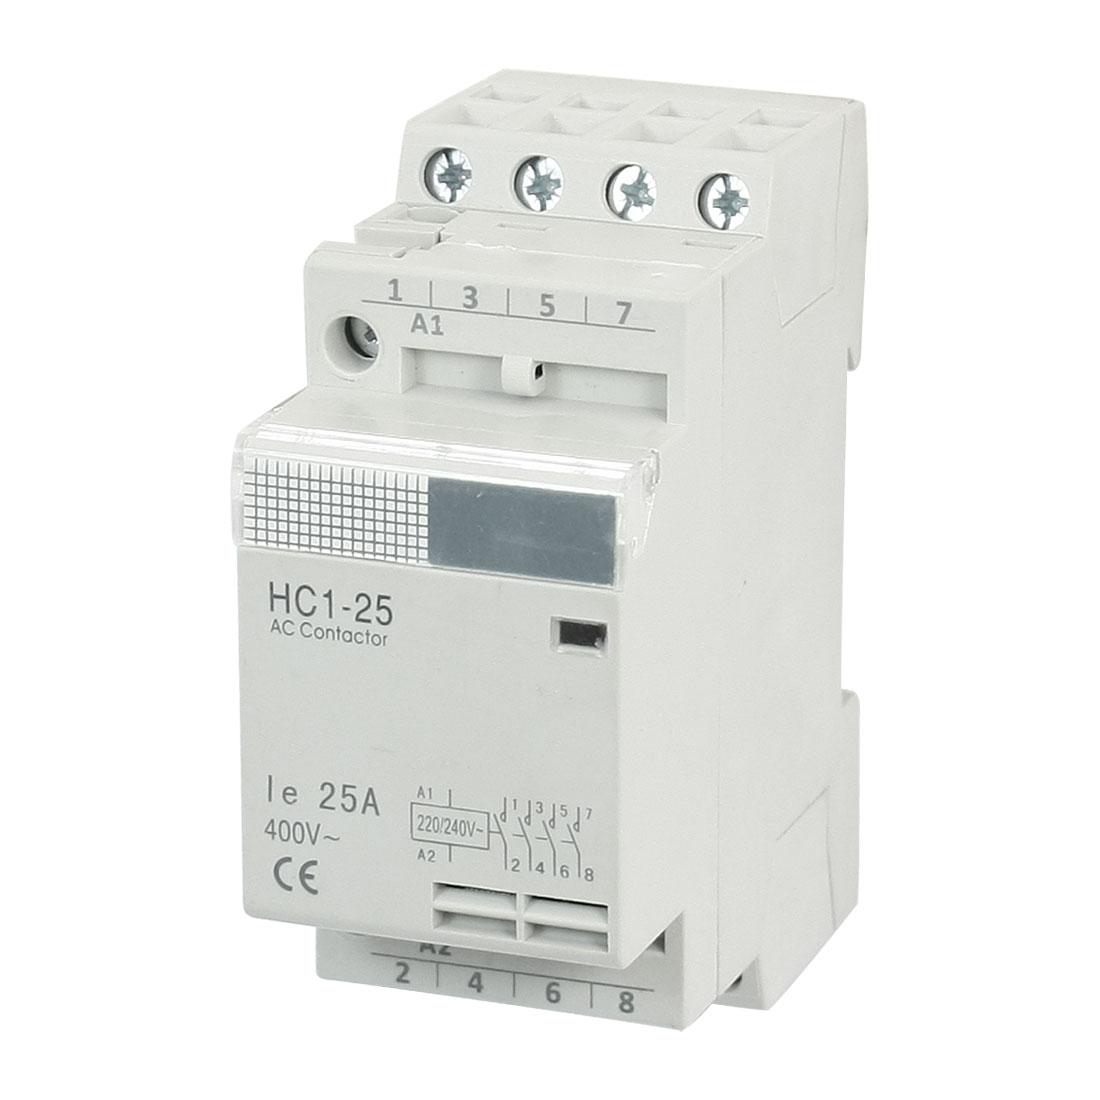 HC1-25 4Pole 35mm DIN Rail Mount Module AC Contactor 220/240V Coil 25A